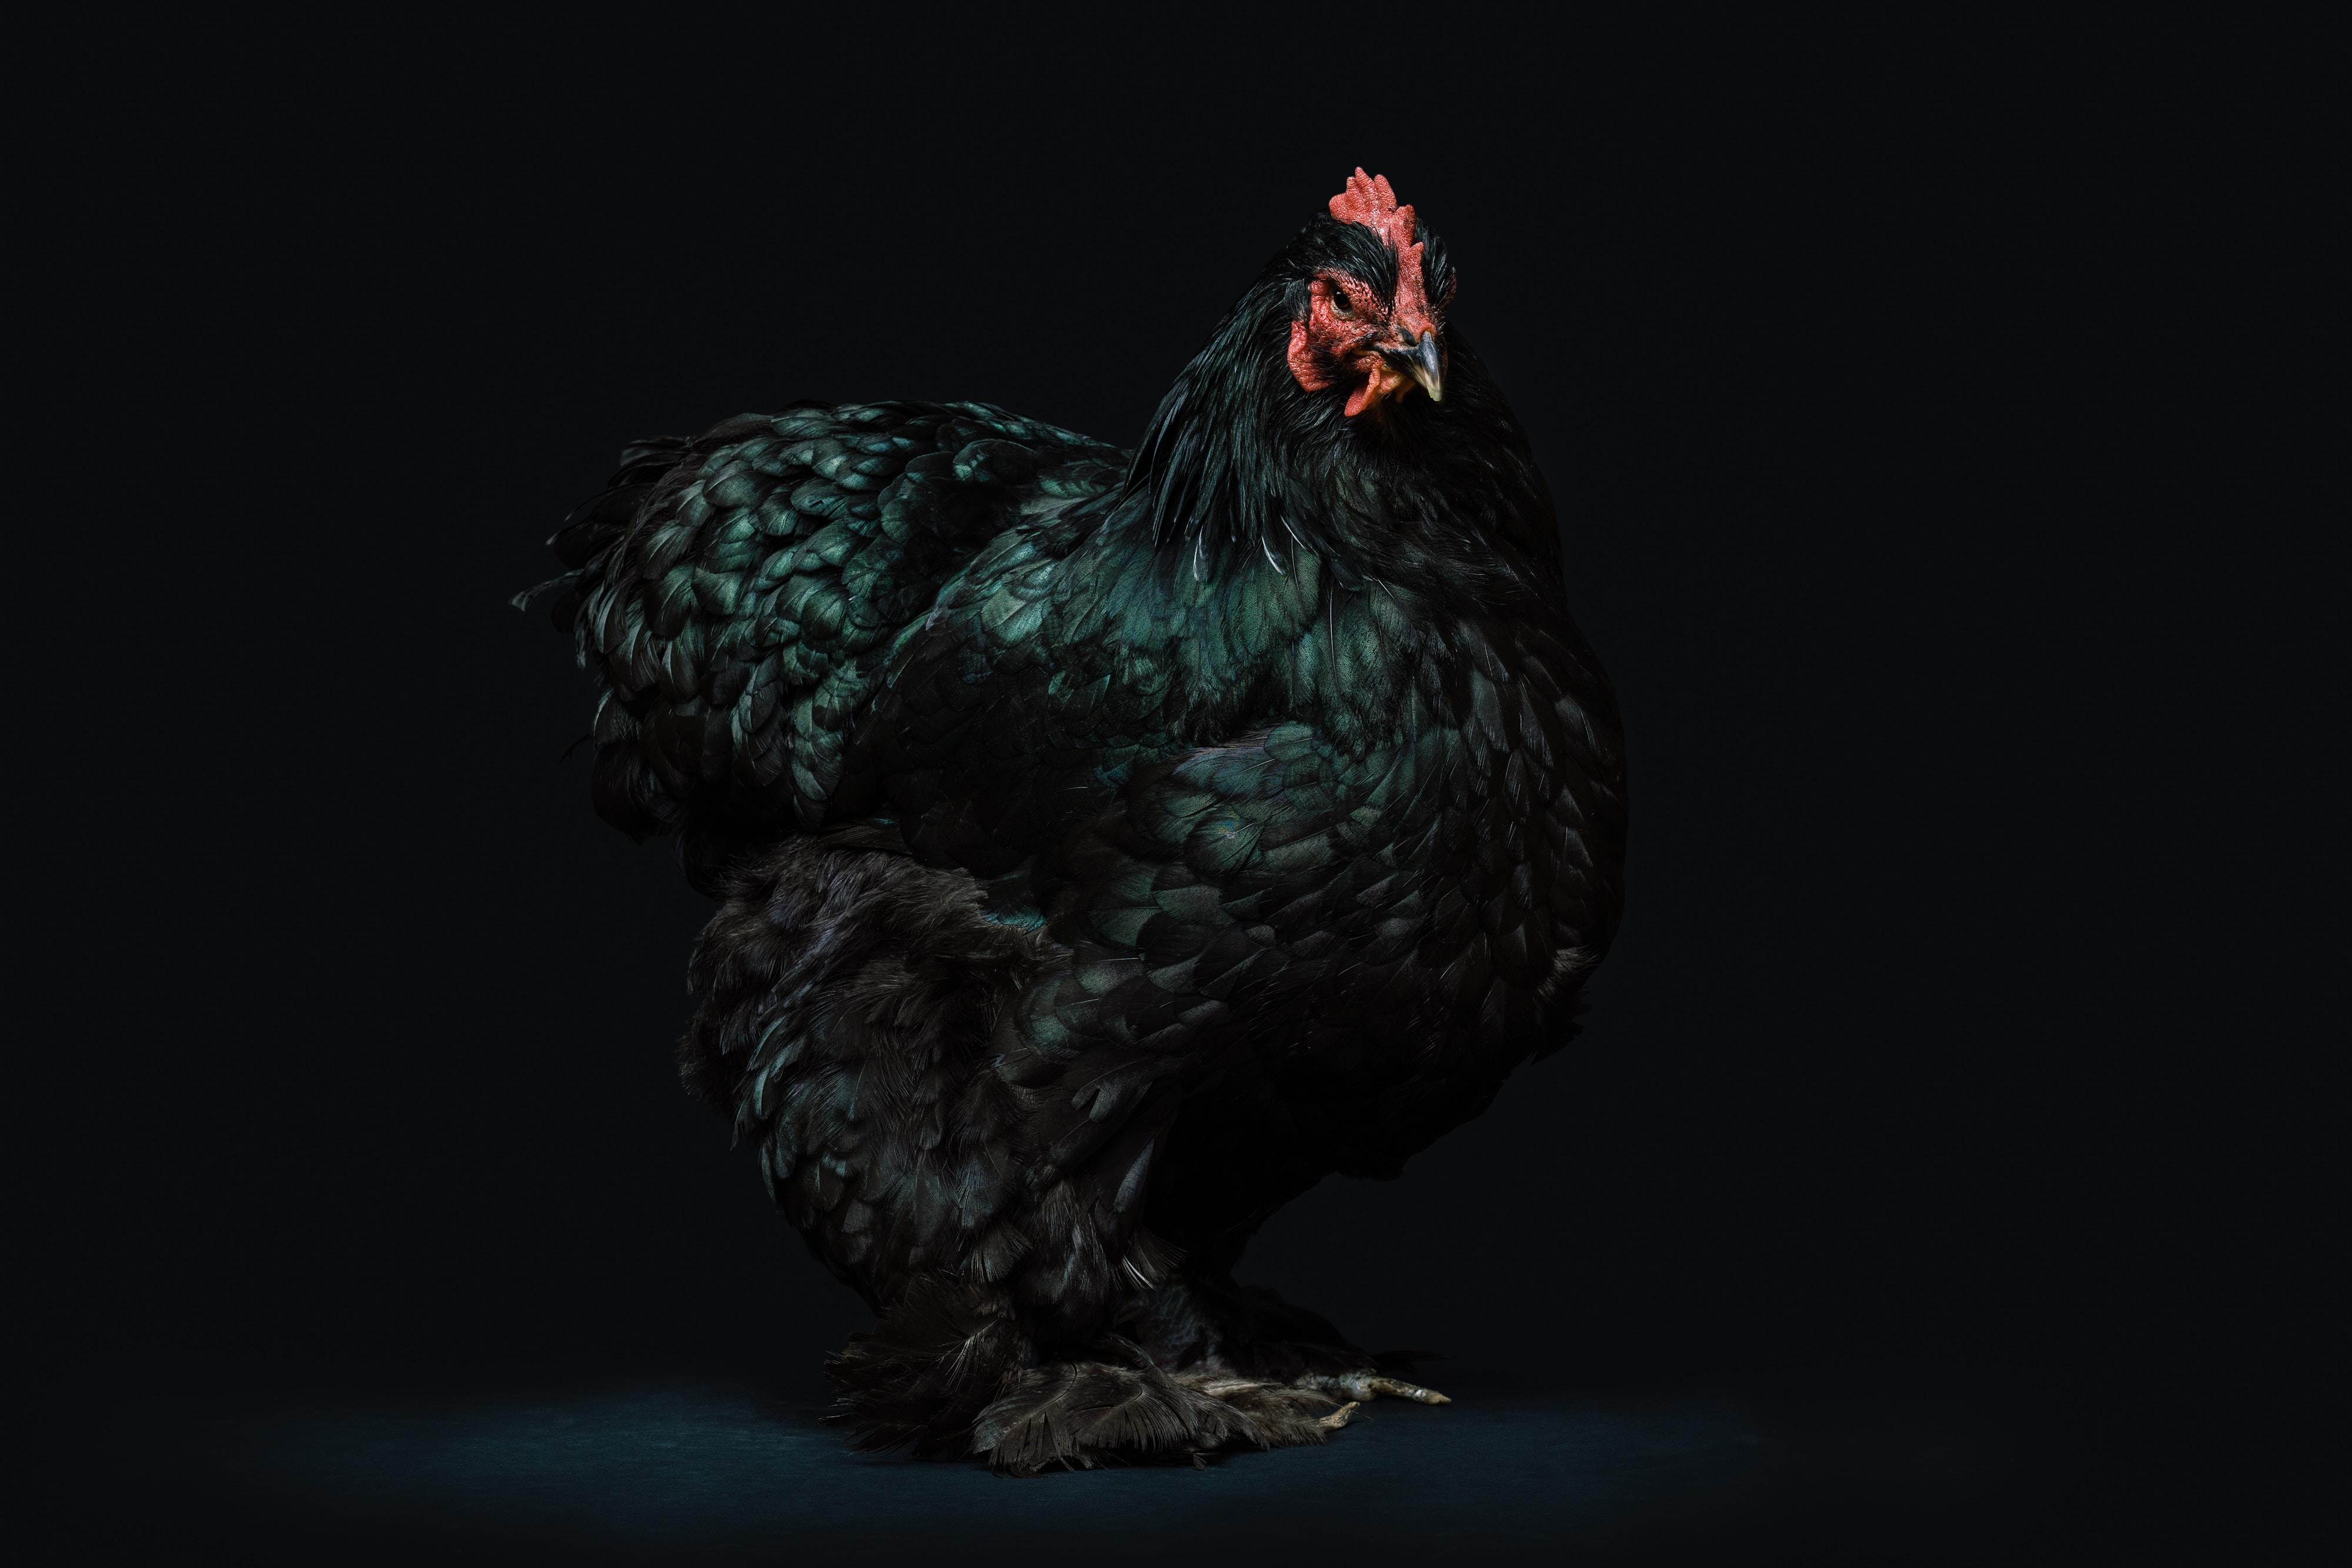 pjolter_image_rooster